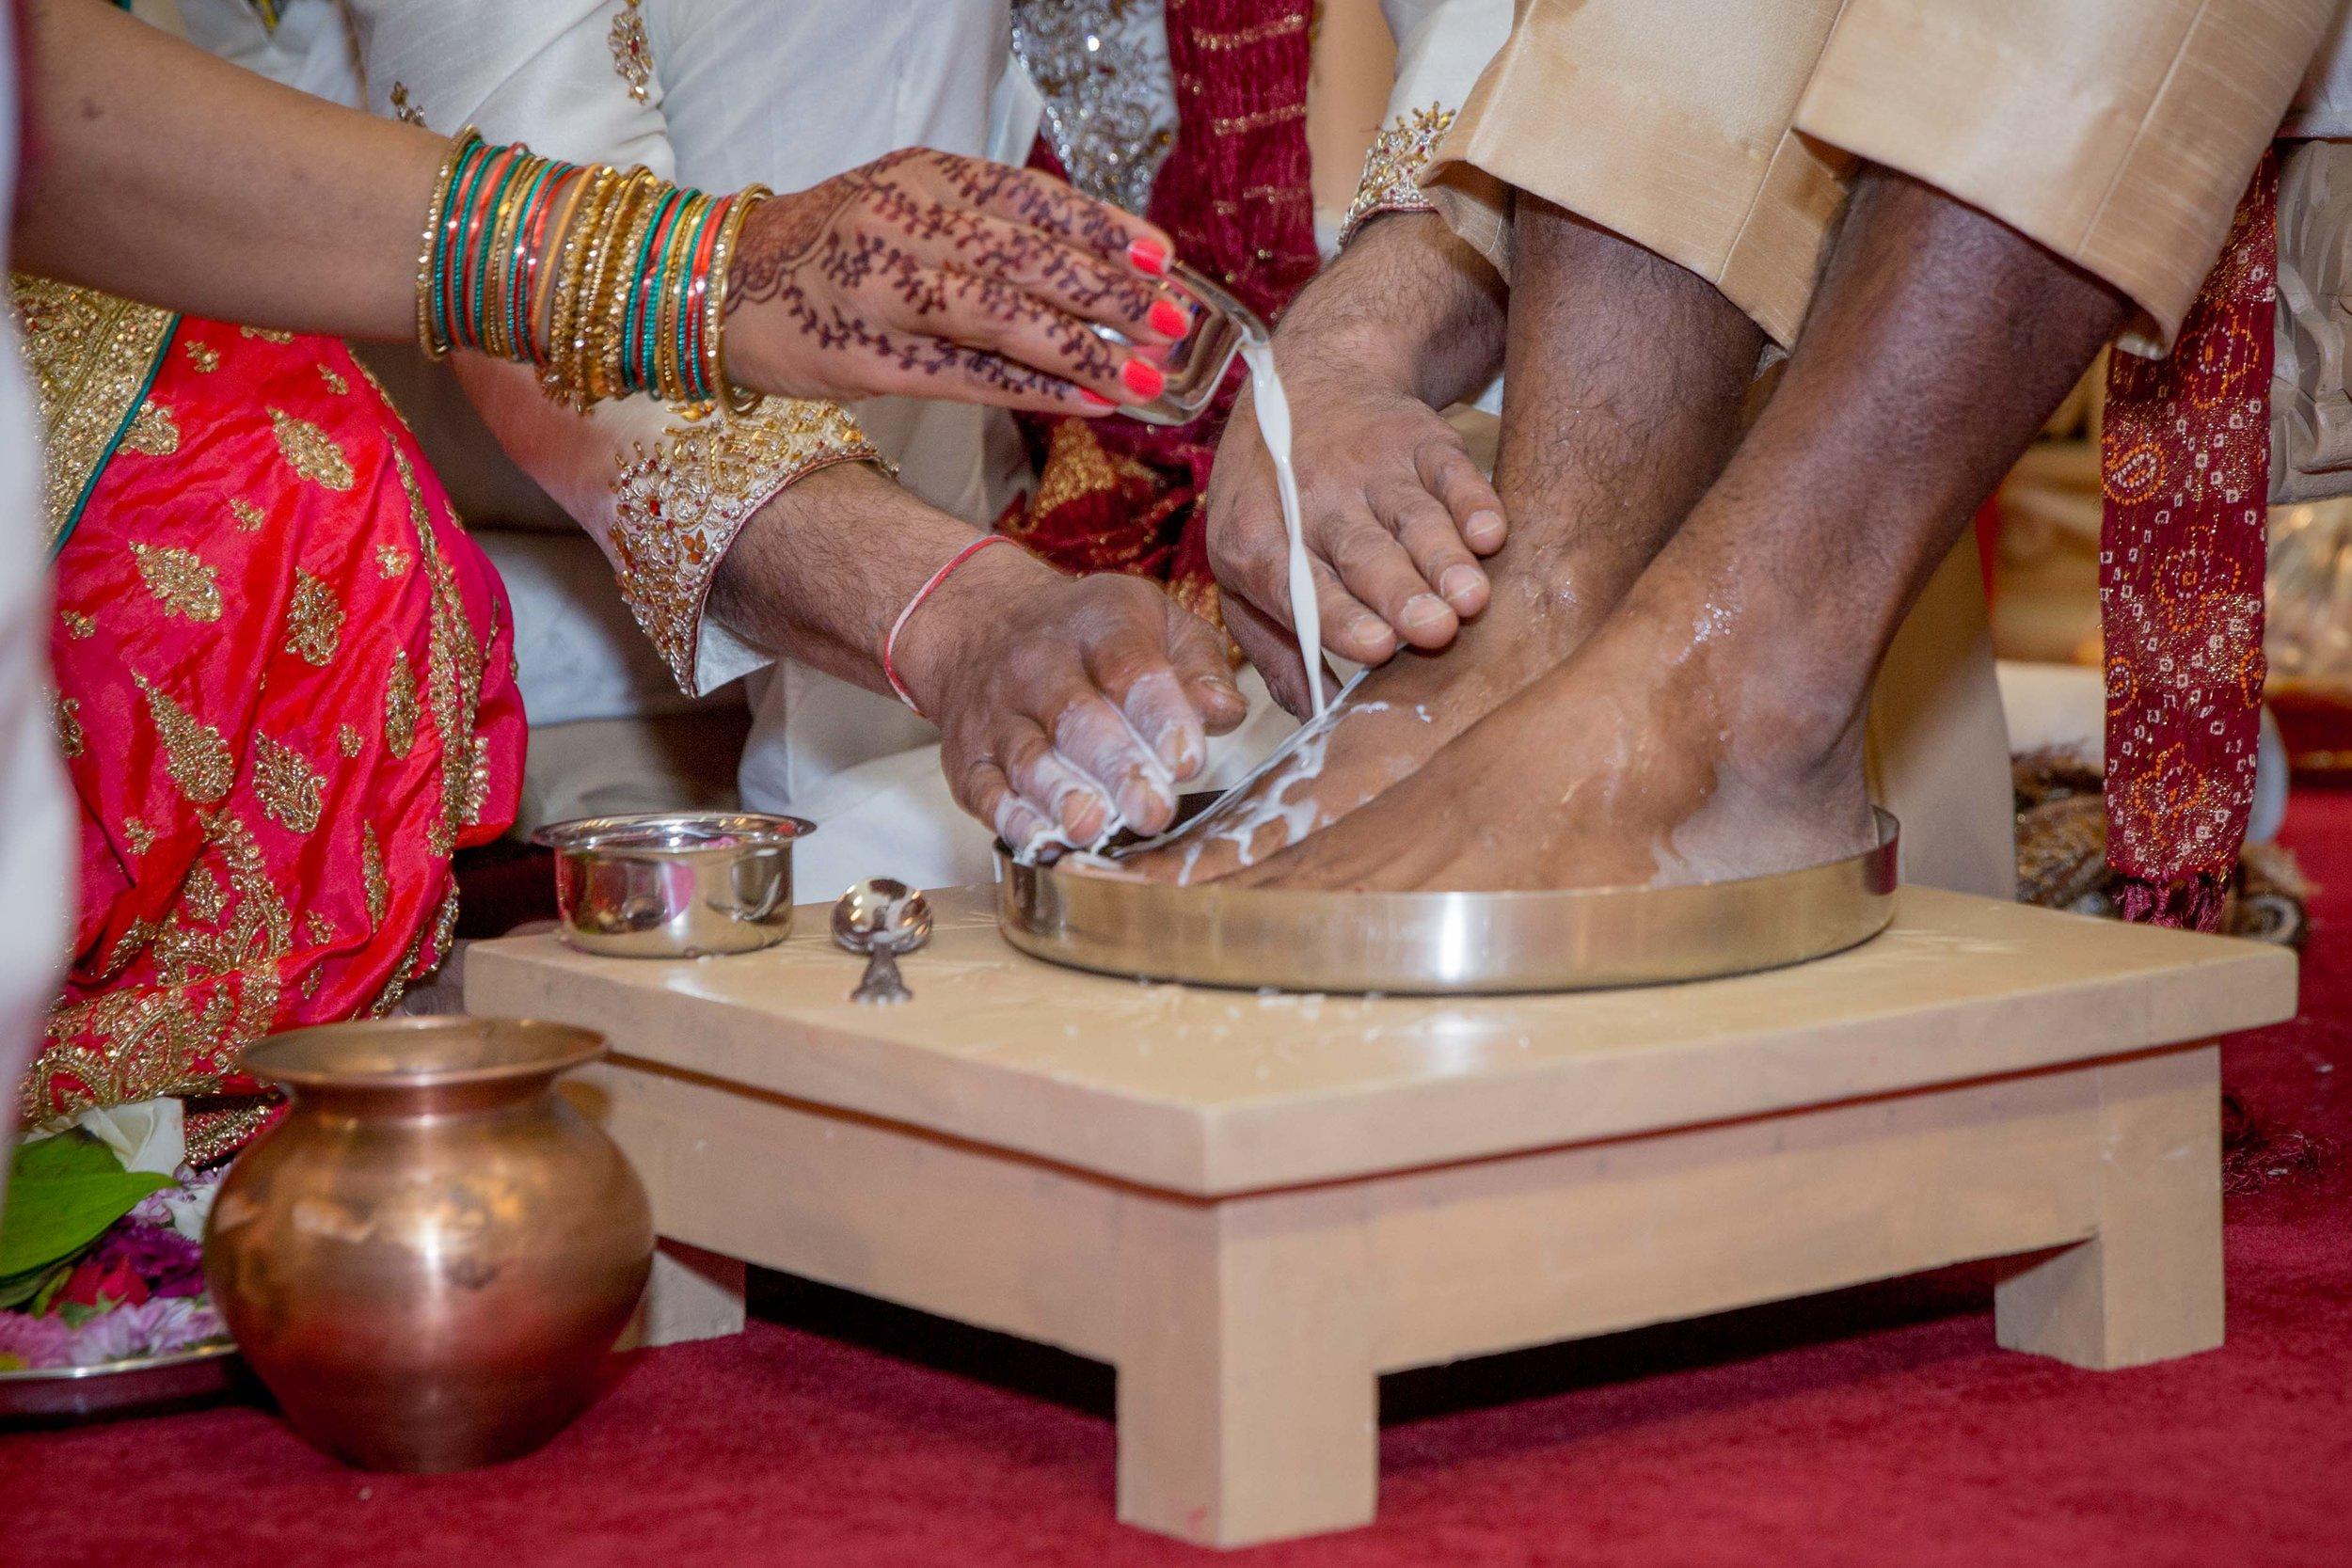 premier-banquetting-london-Hindu-asian-wedding-photographer-natalia-smith-photography-12.jpg